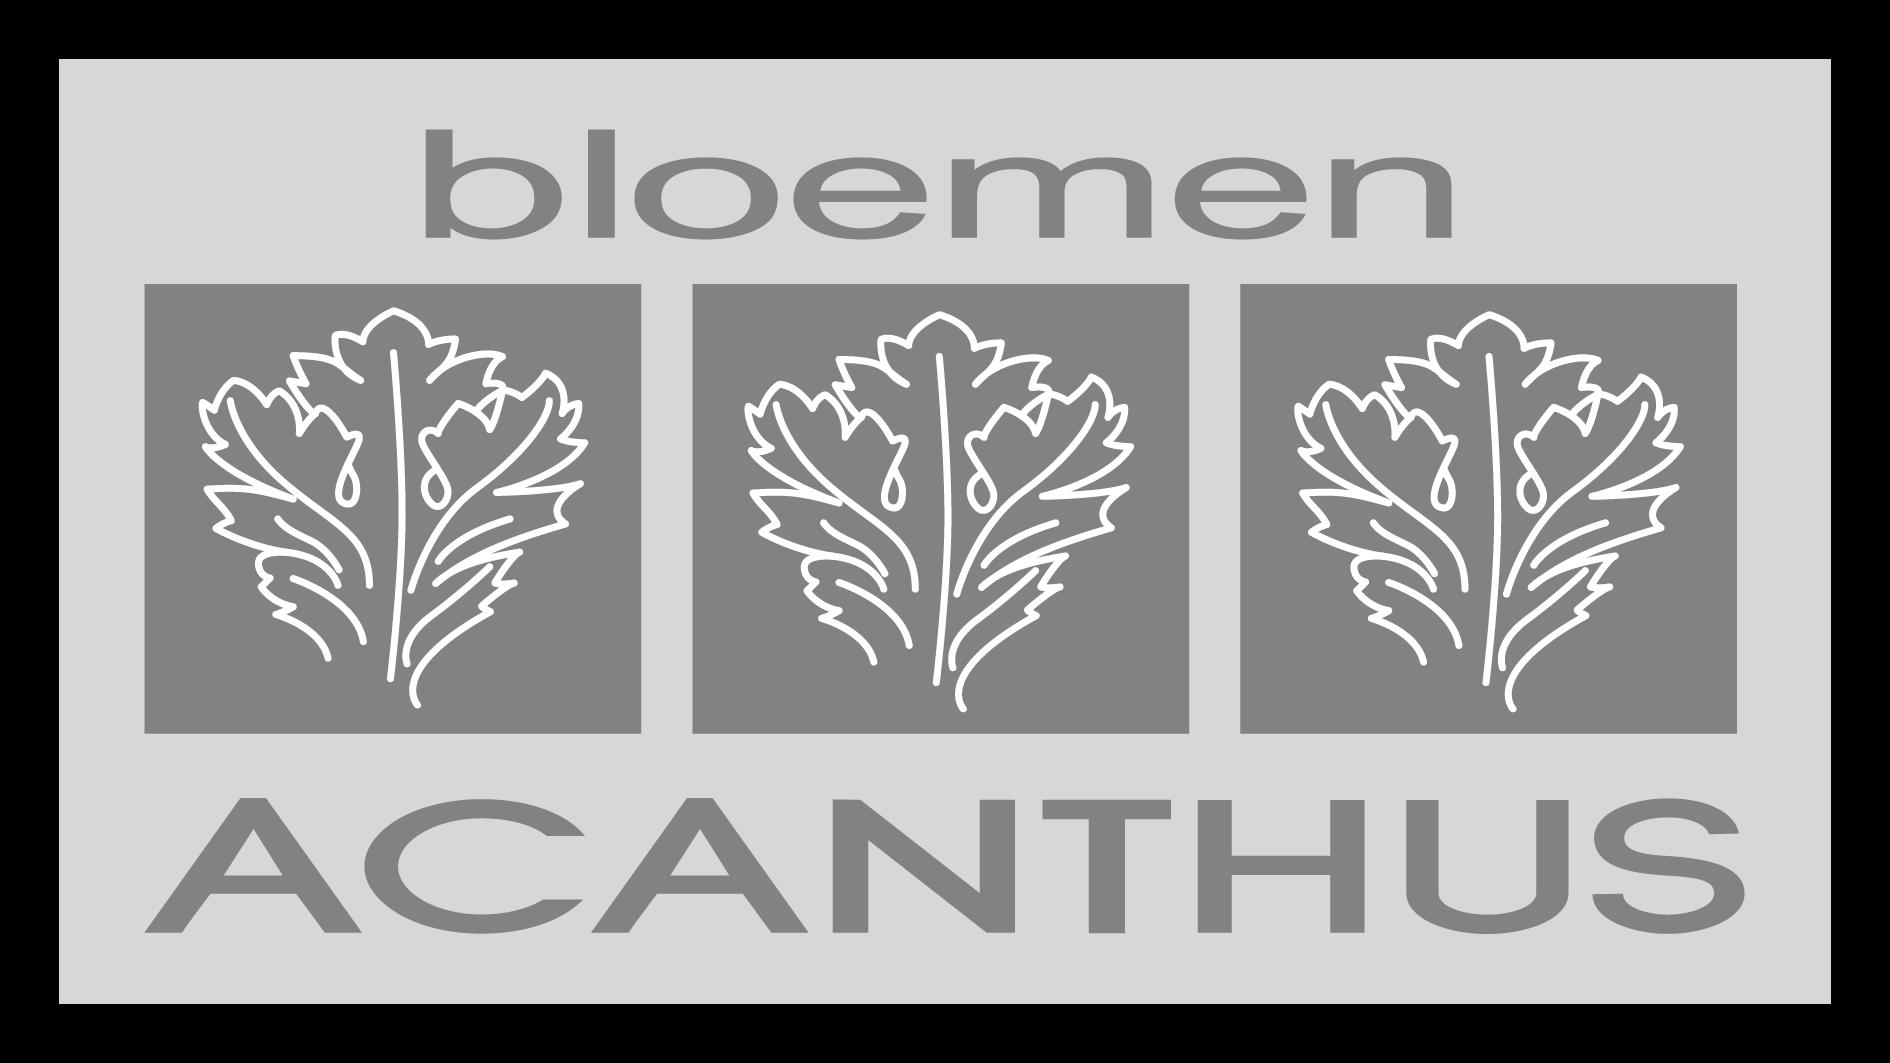 Bloemen Acanthus | Moorslede